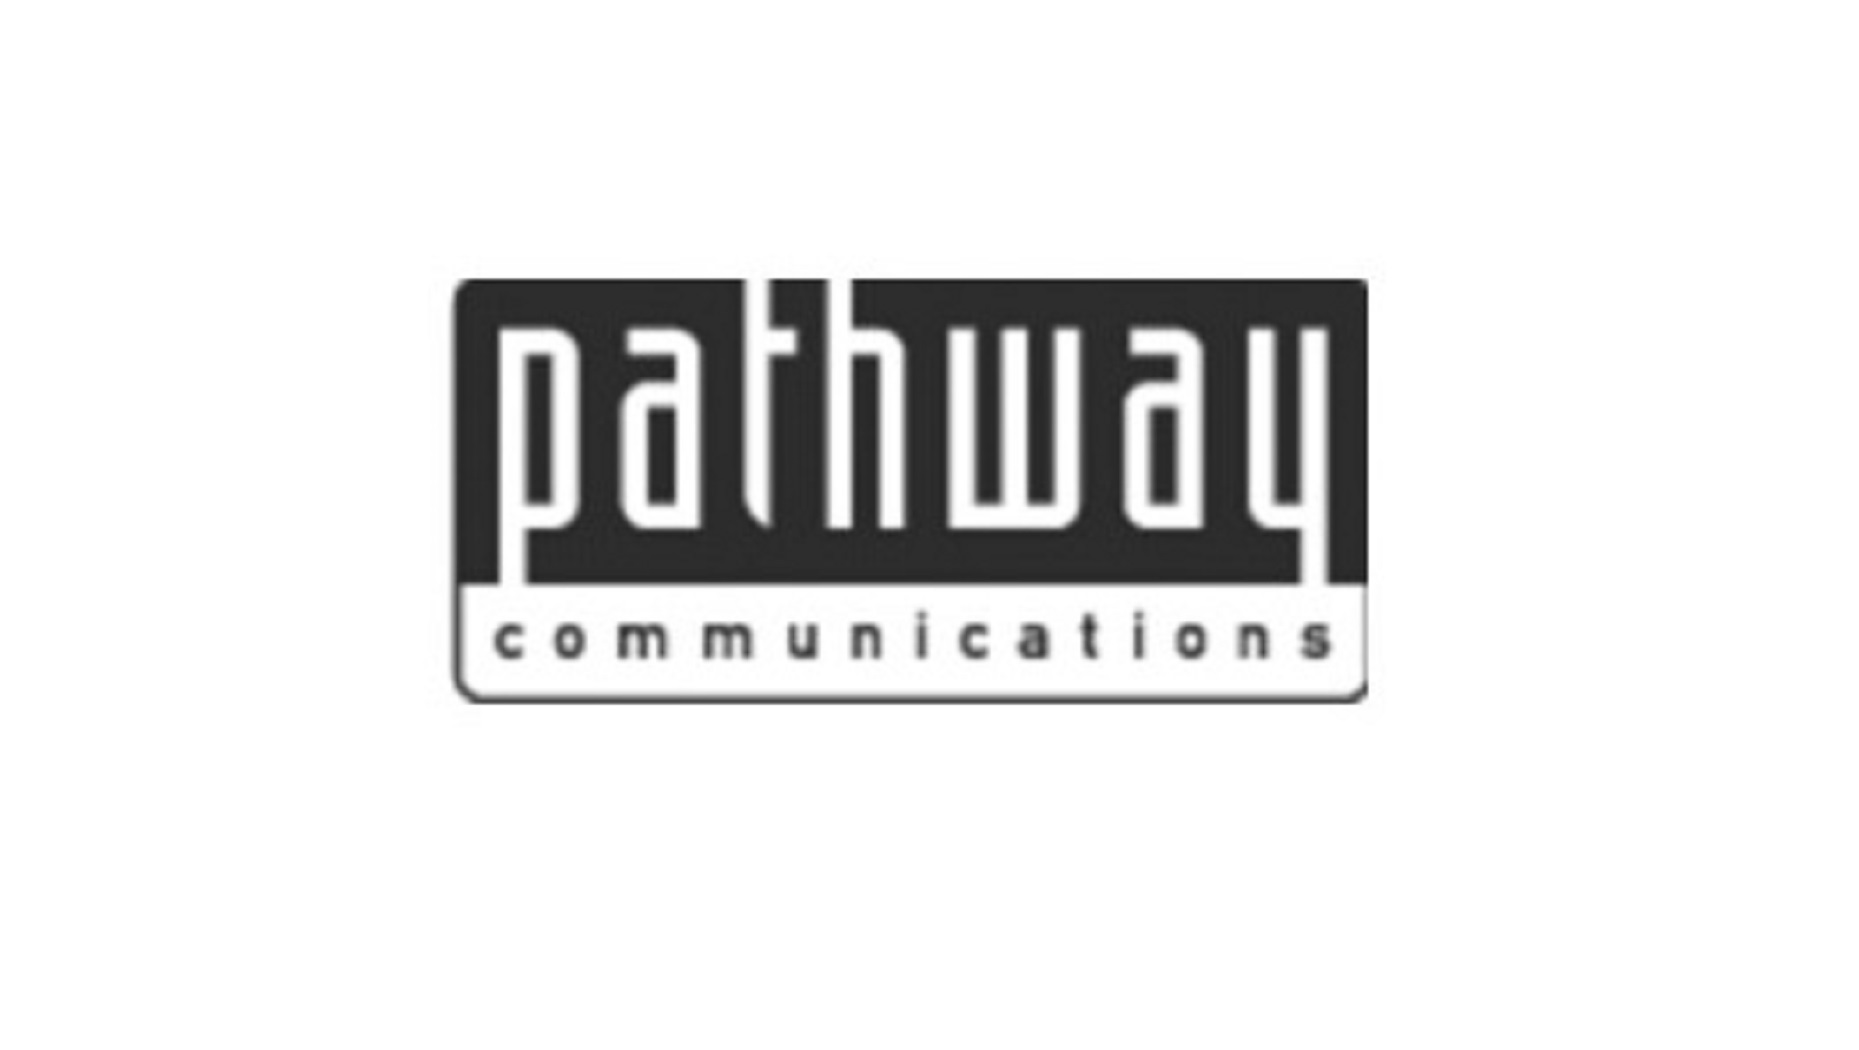 Pathway Communications